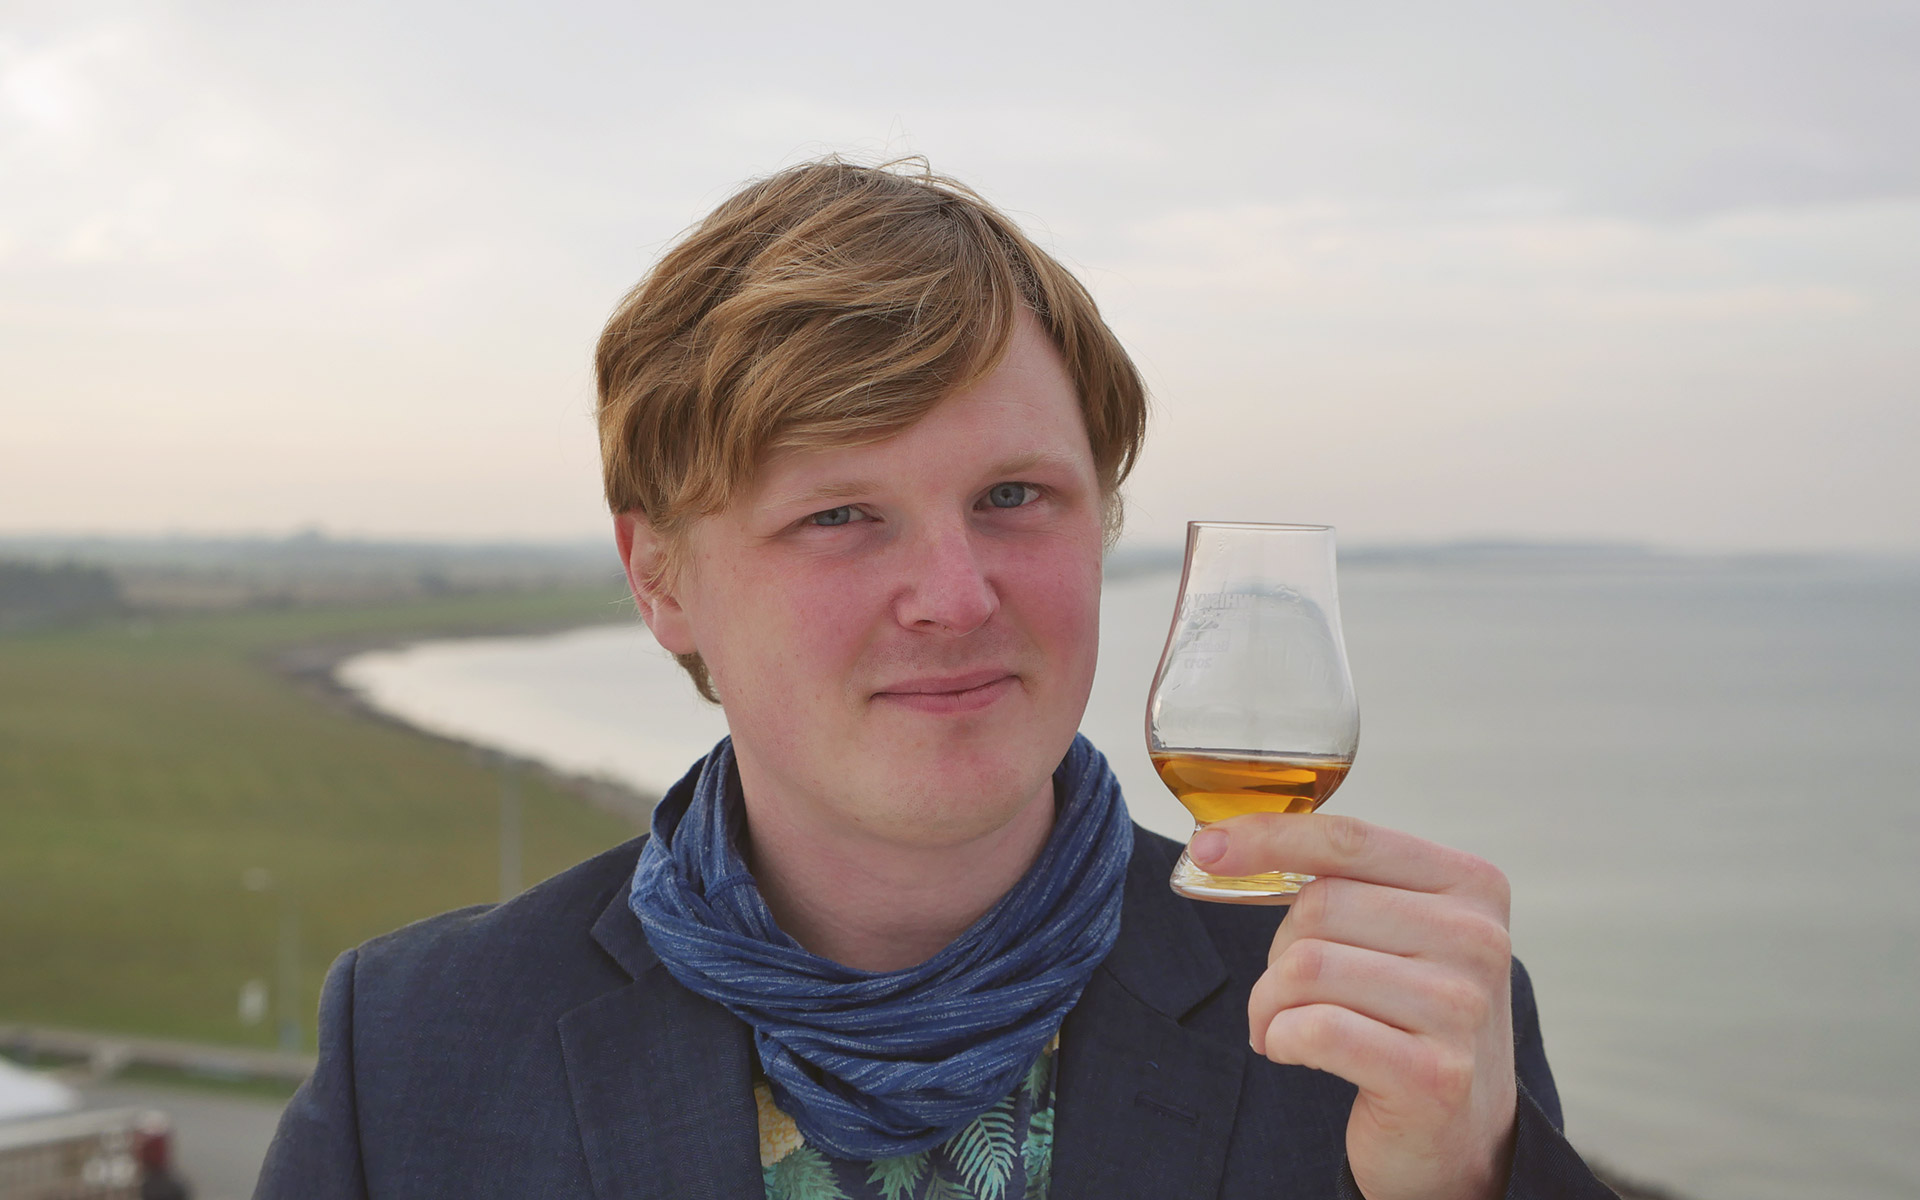 Productomschrijving Riedel Vinum Single Malt whiskyglas - 2 stuks